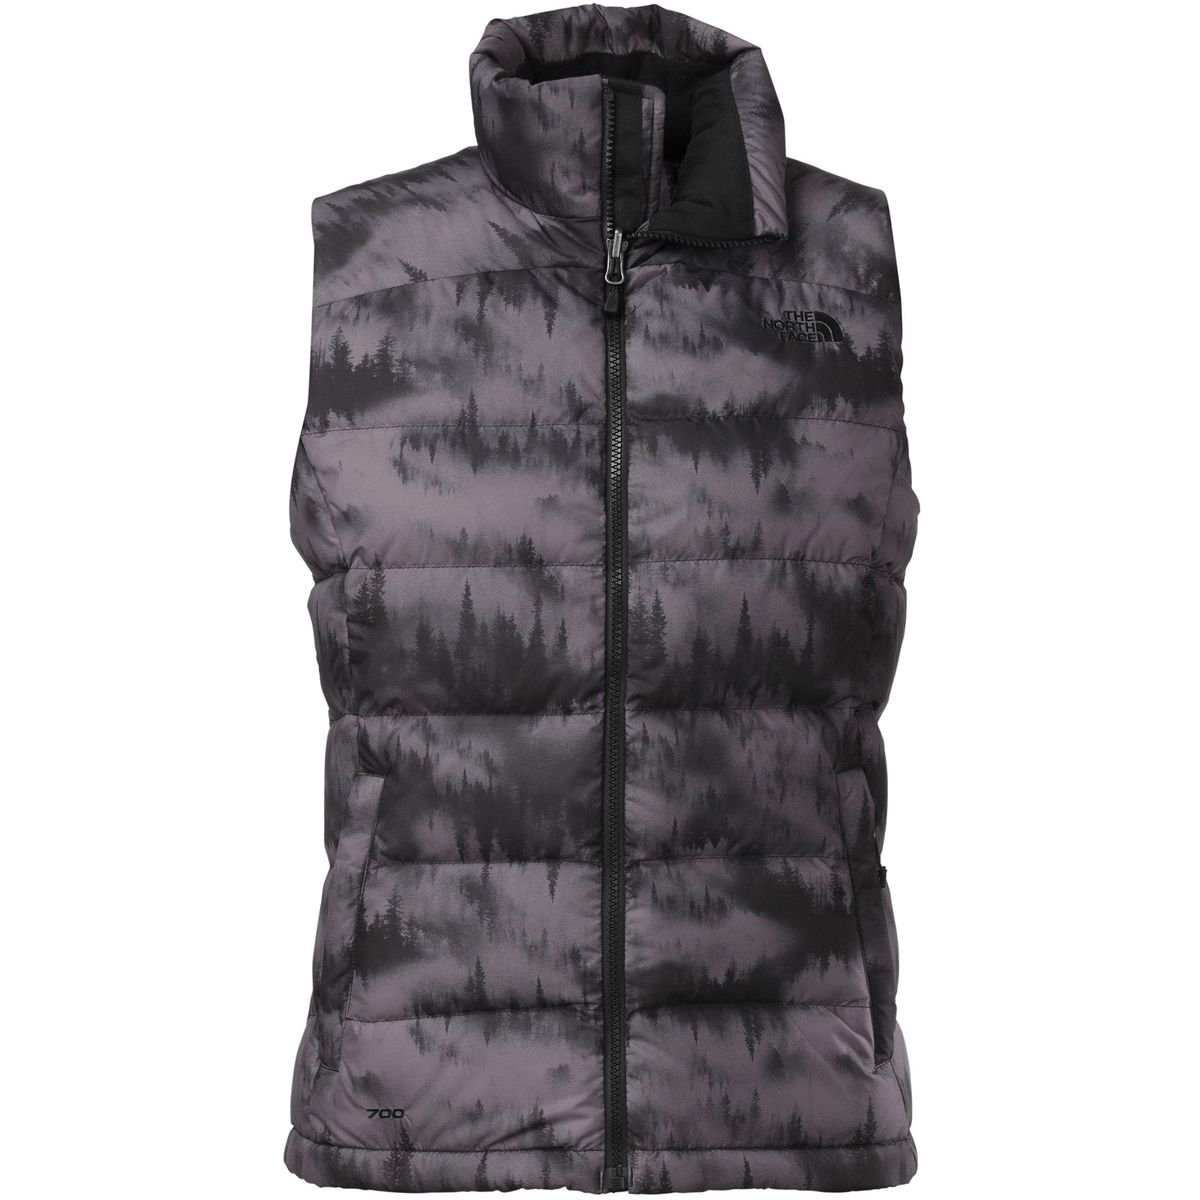 e84fe9d41 The North Face Women's Nuptse 2 Vest